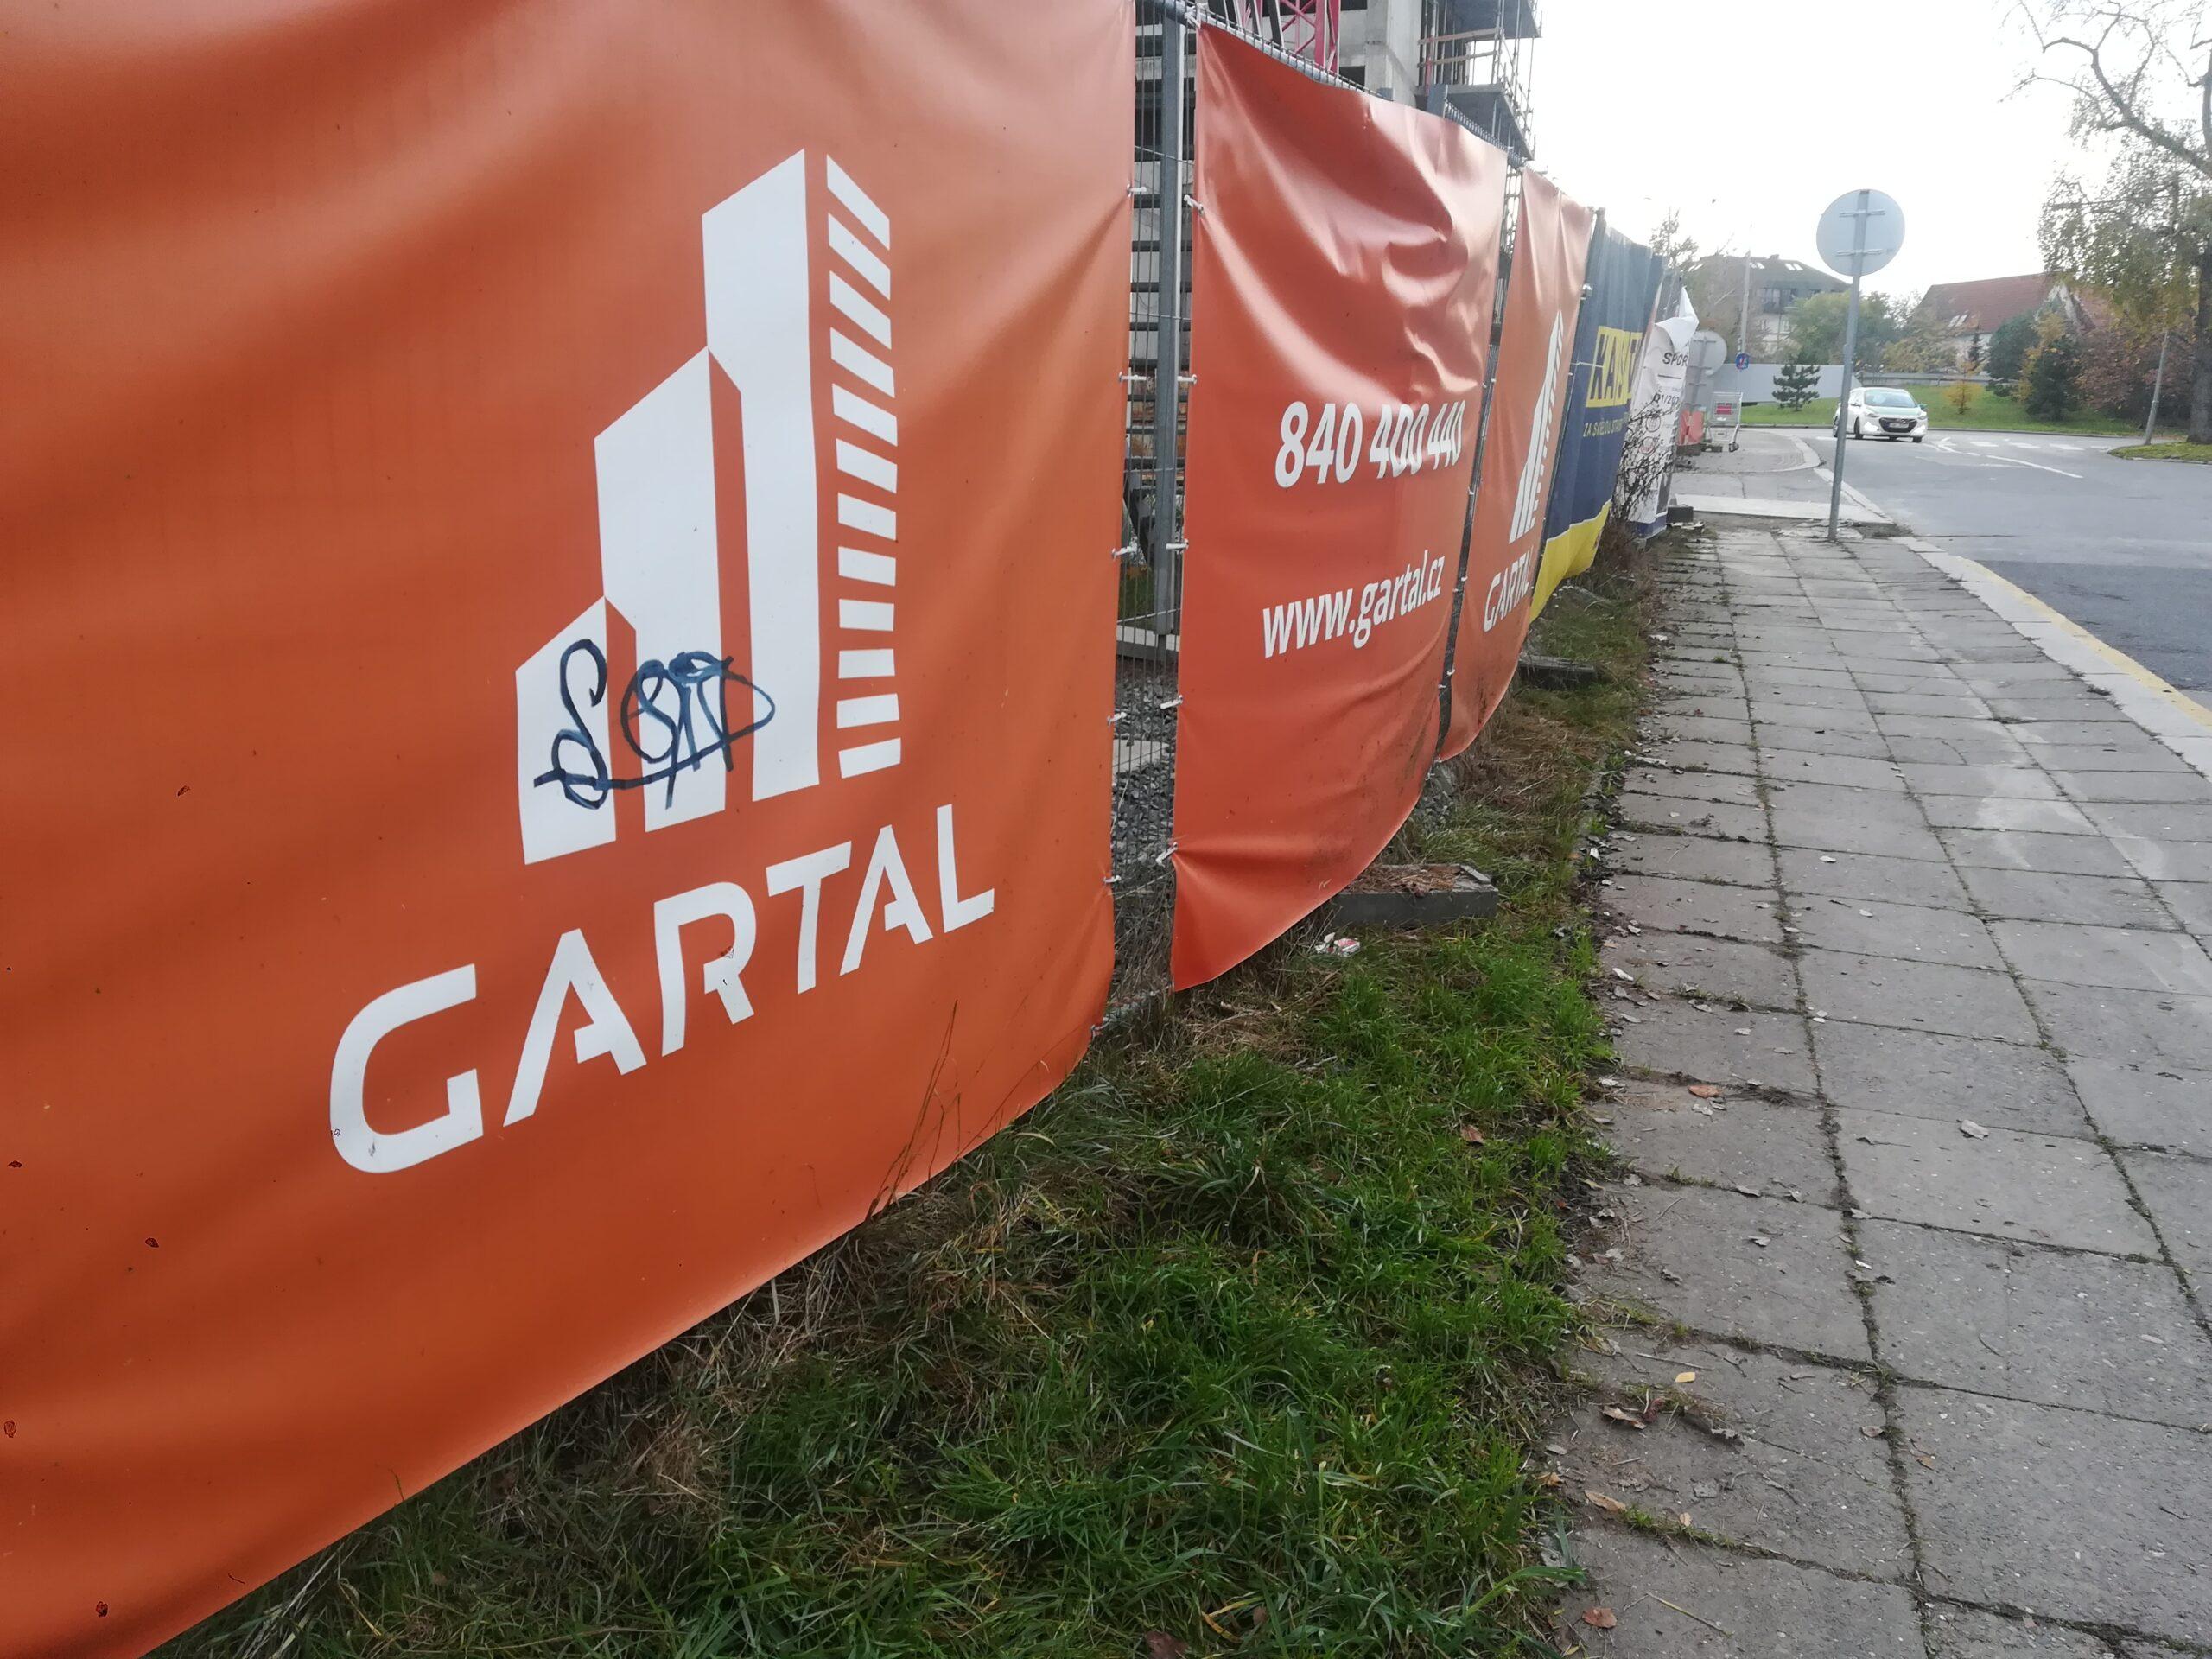 Gartal: Nové byty v oblasti Záběhlic